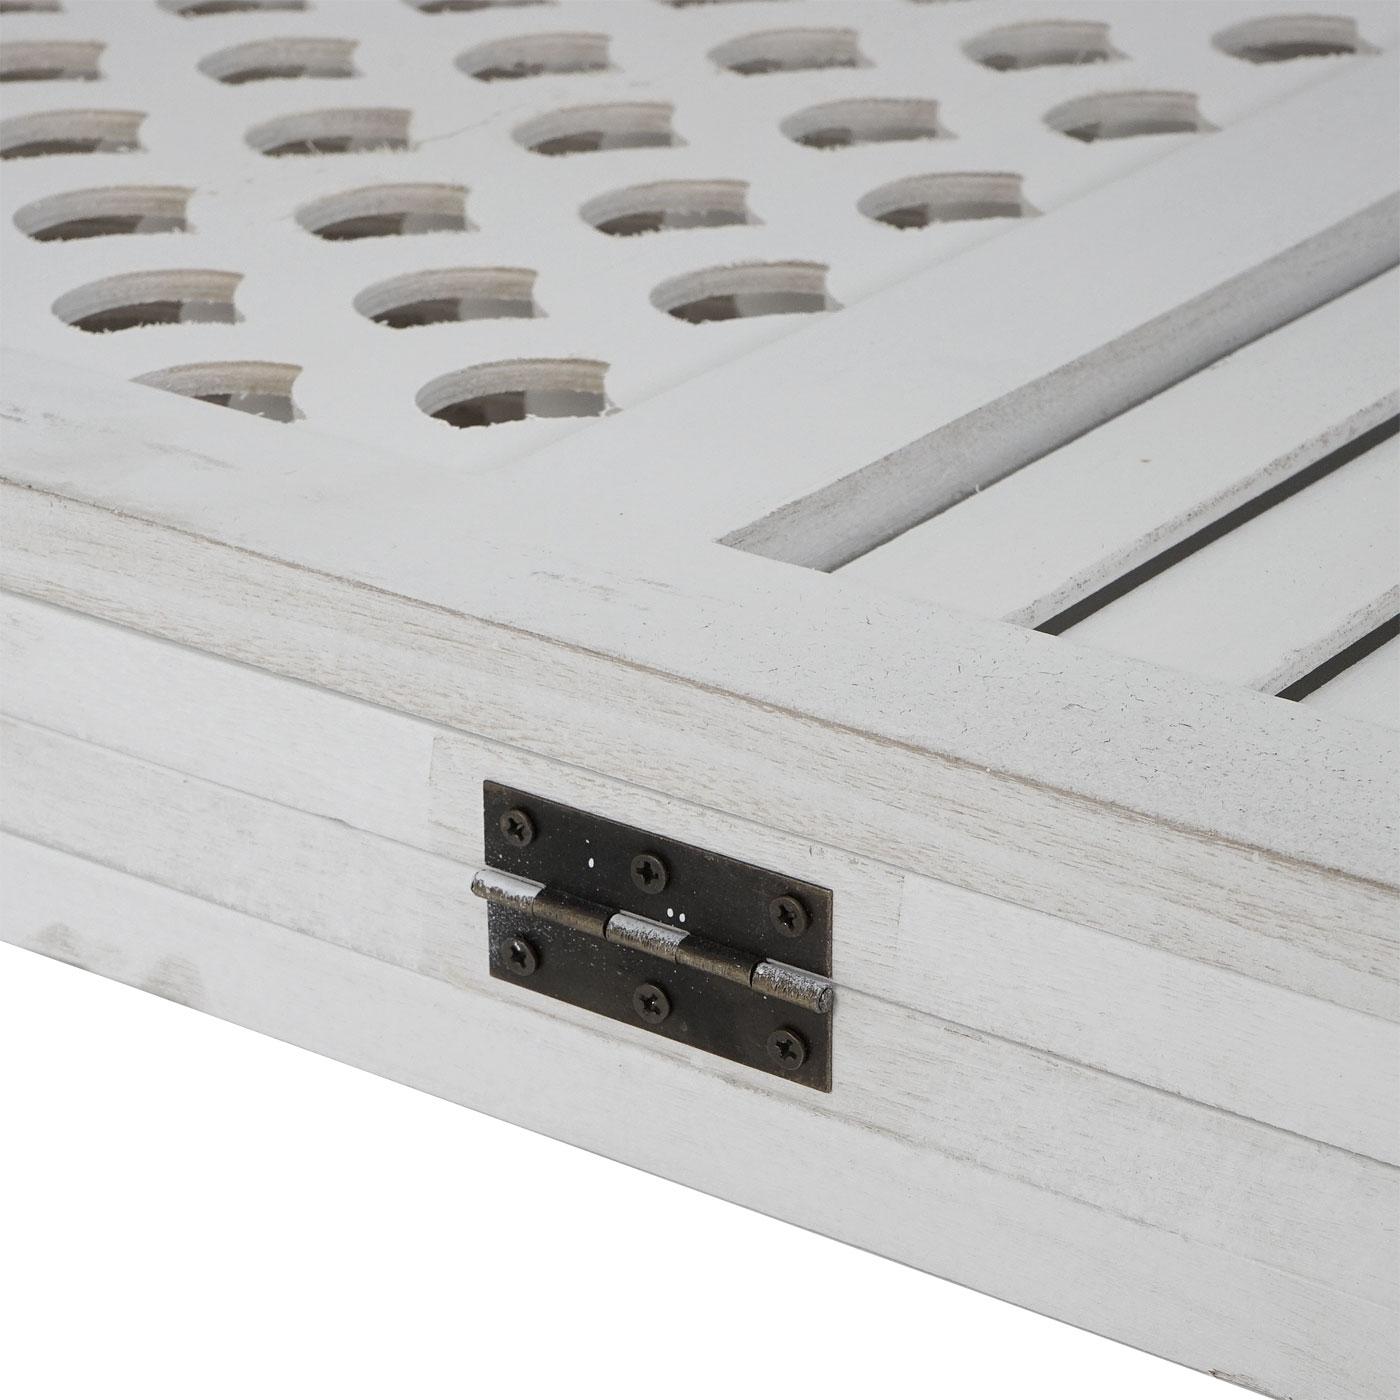 Raumteiler Trennwand Sichtschutz Mendler Paravent HWC-A84 Ornamente 170x161cm ~ braun